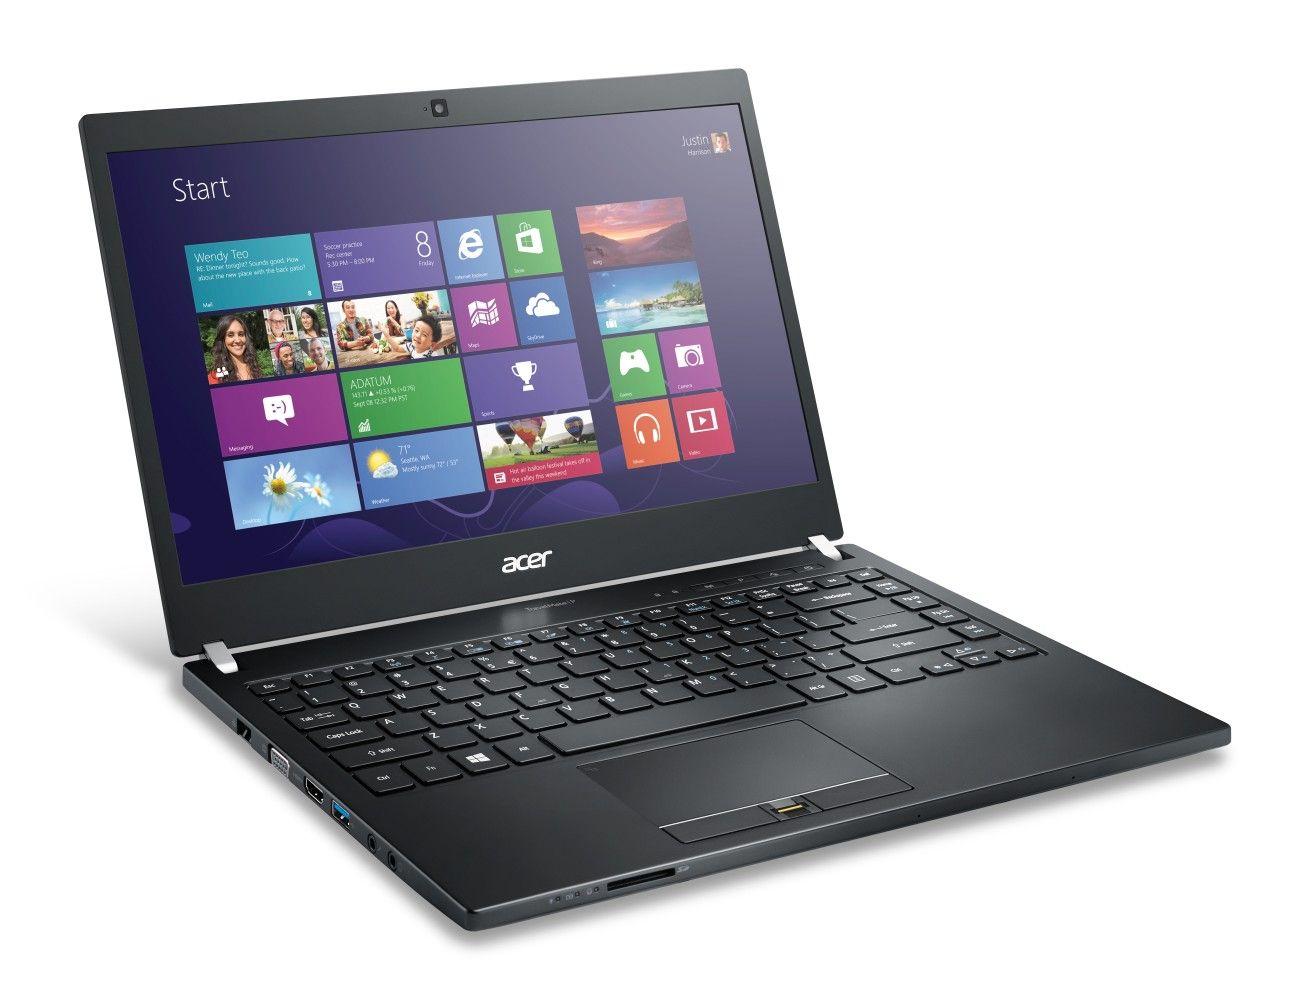 Acer TravelMate P645 - 5